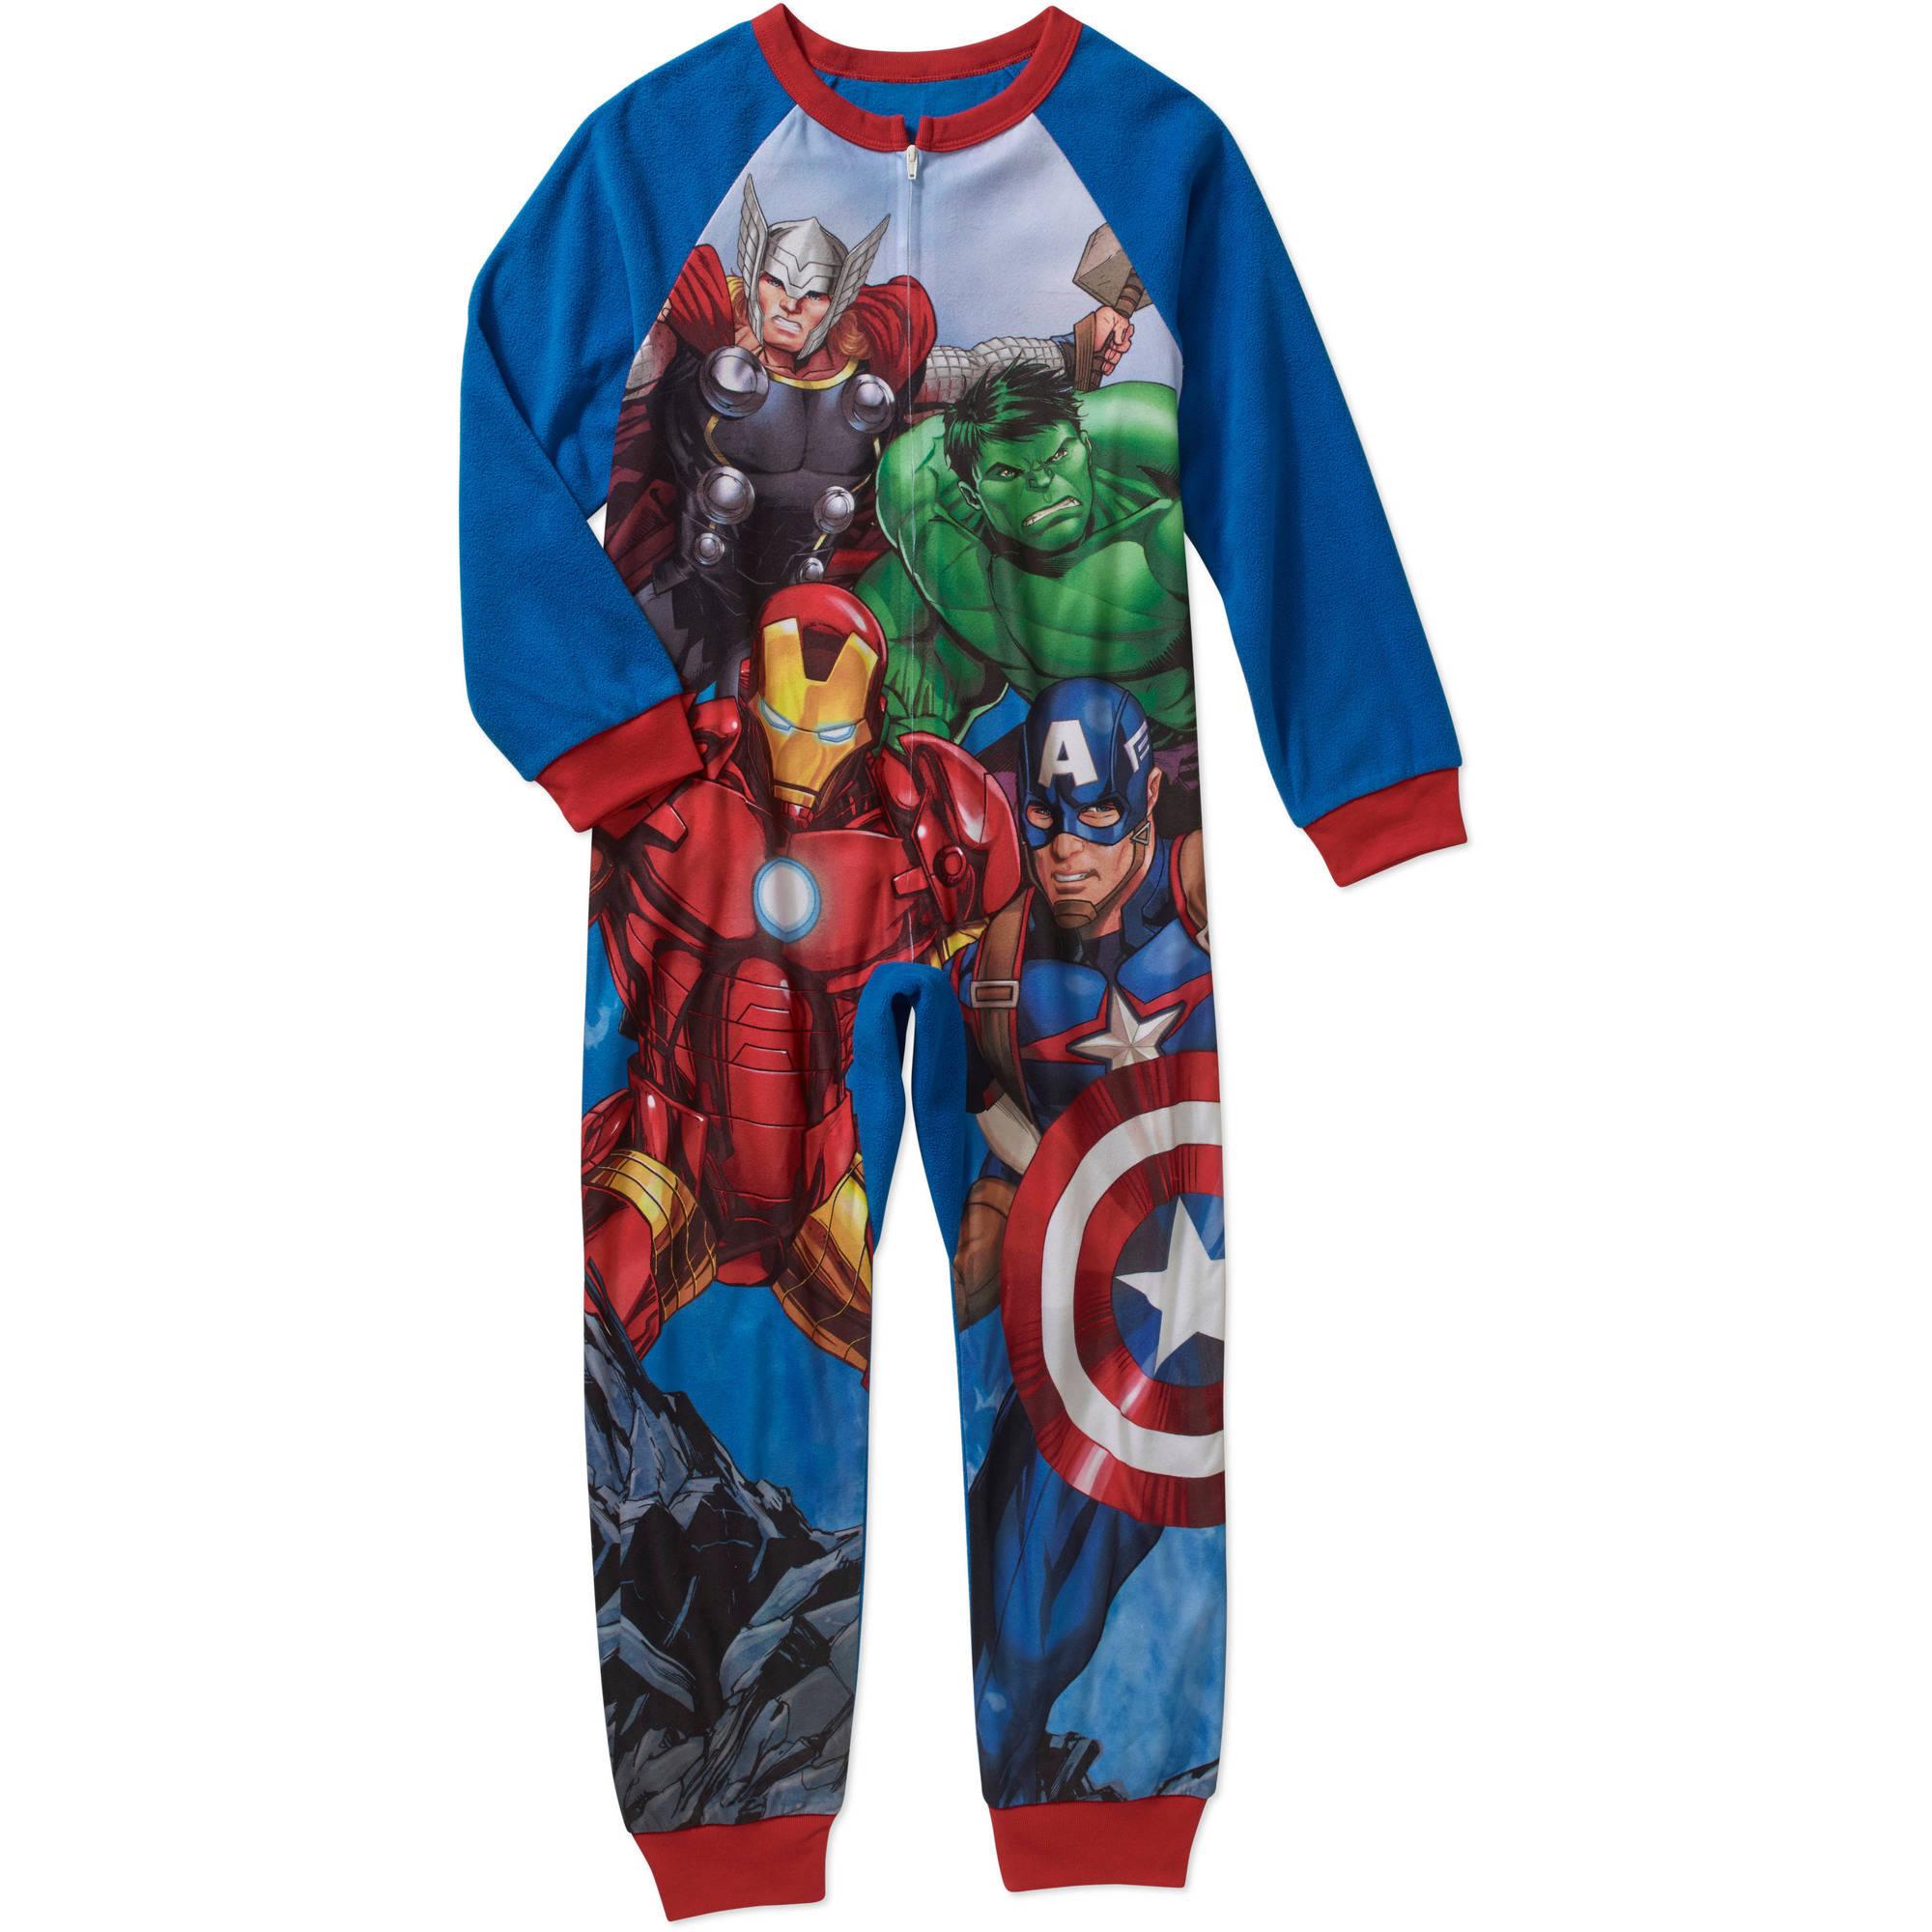 Marvel Avengers Captain America Size 12 Hooded Fleece Pajama Sleeper Sleepwear Robes Clothing